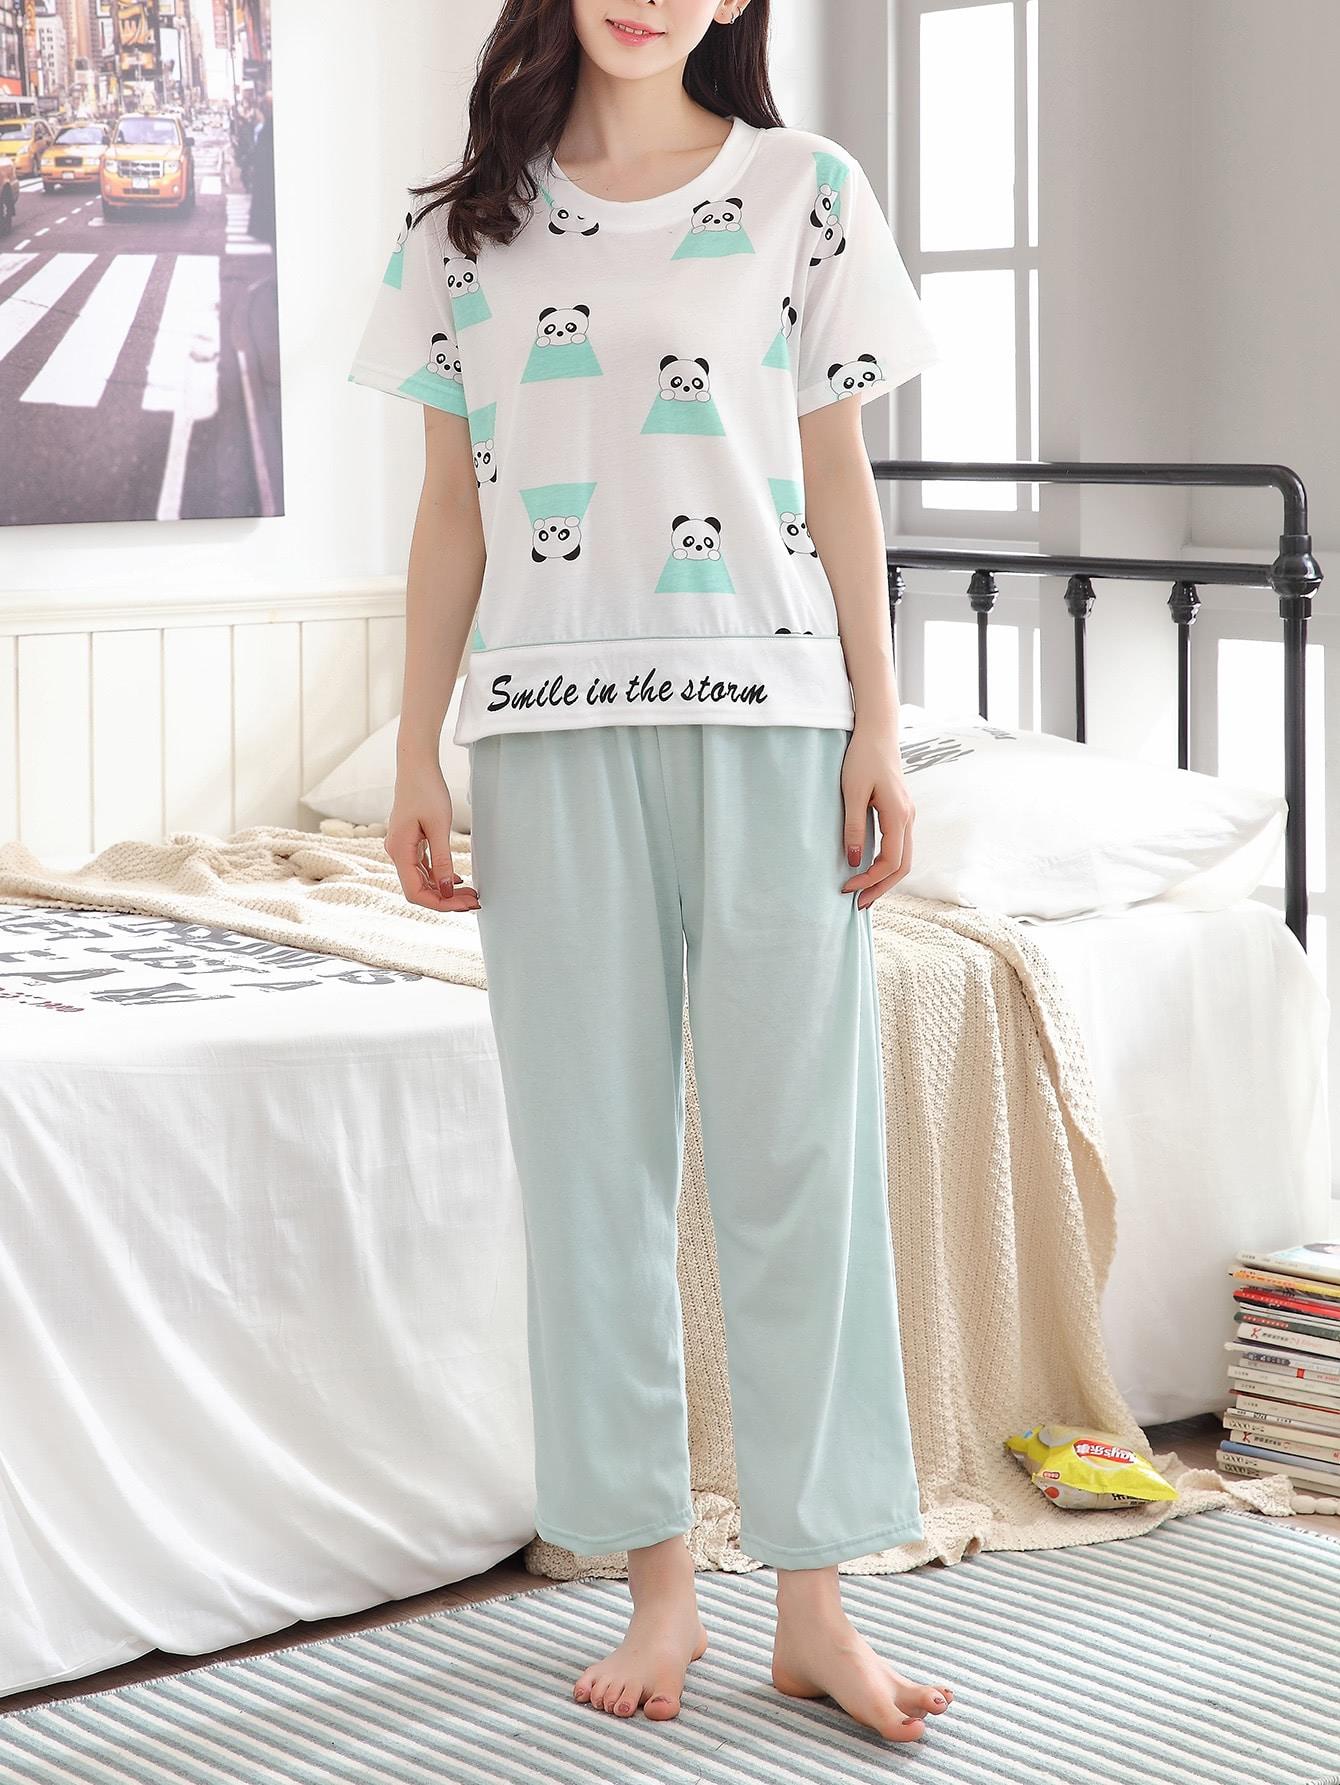 Panda Print Top And Pants Pajama Set flamingo and jungle leaf print top and pants pajama set